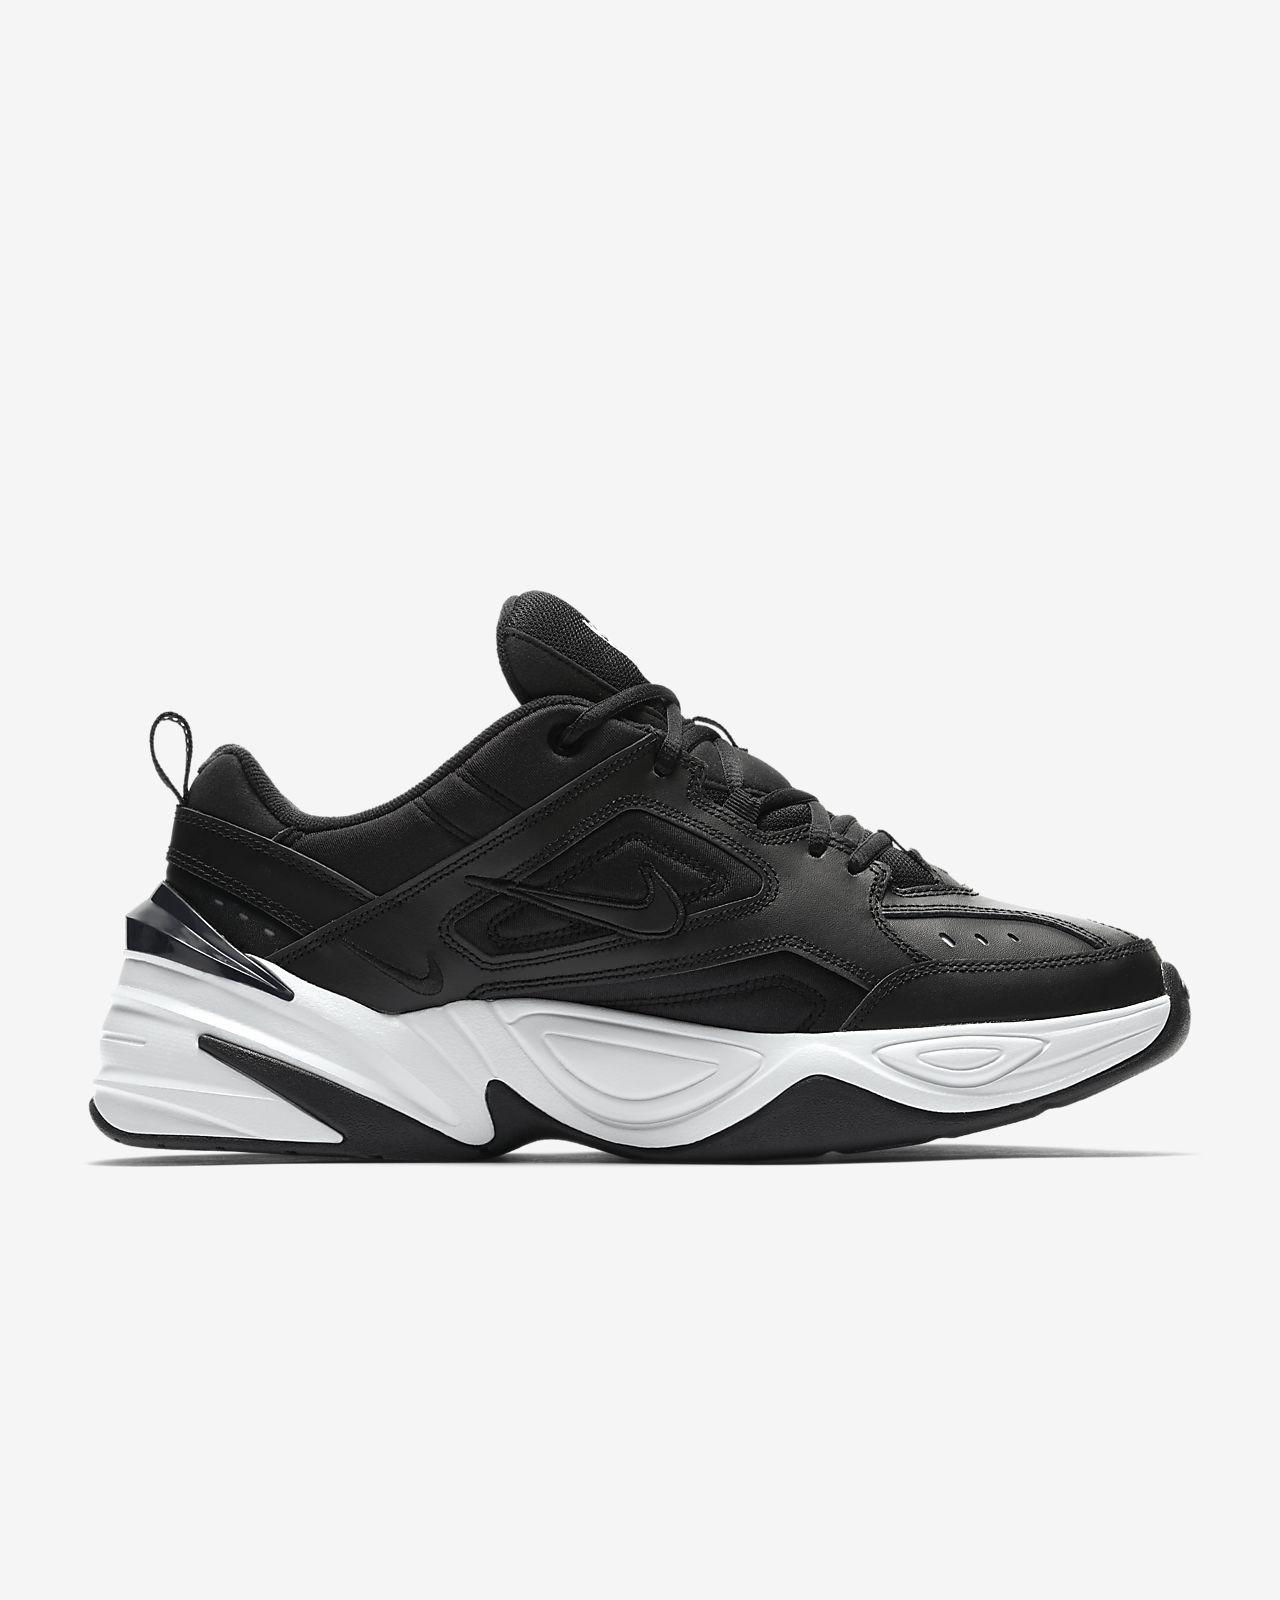 temperament shoes good looking save off Nike M2K Tekno Herrenschuh